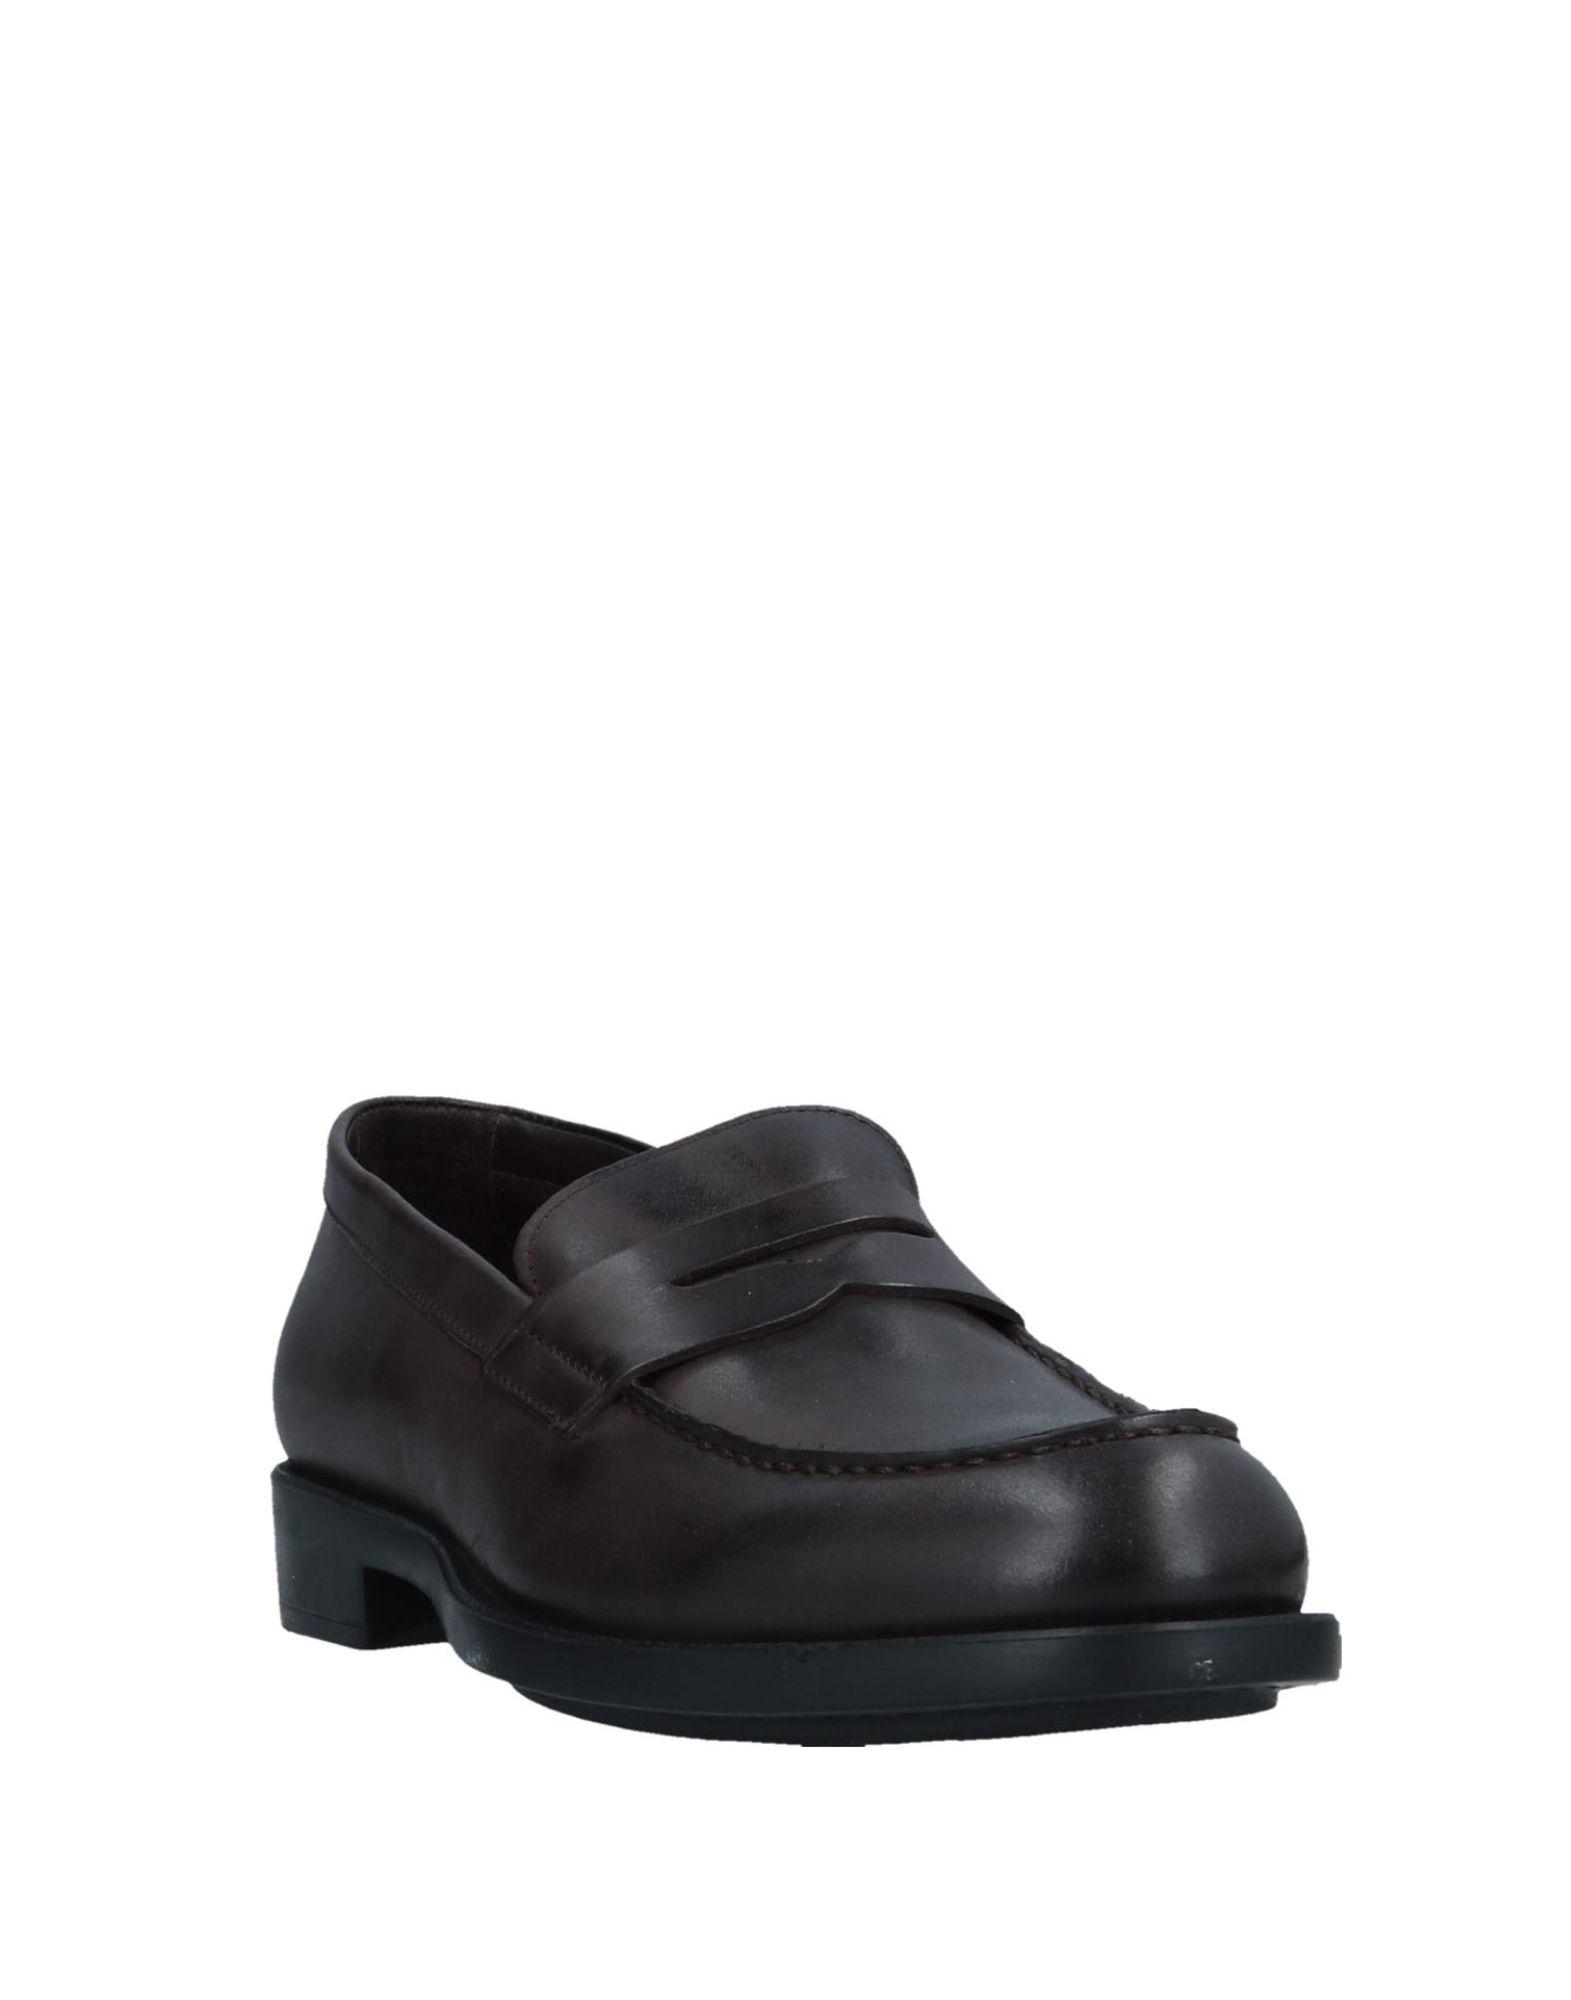 Rabatt Mokassins echte Schuhe Triver Flight Mokassins Rabatt Herren  11557196FV f80337